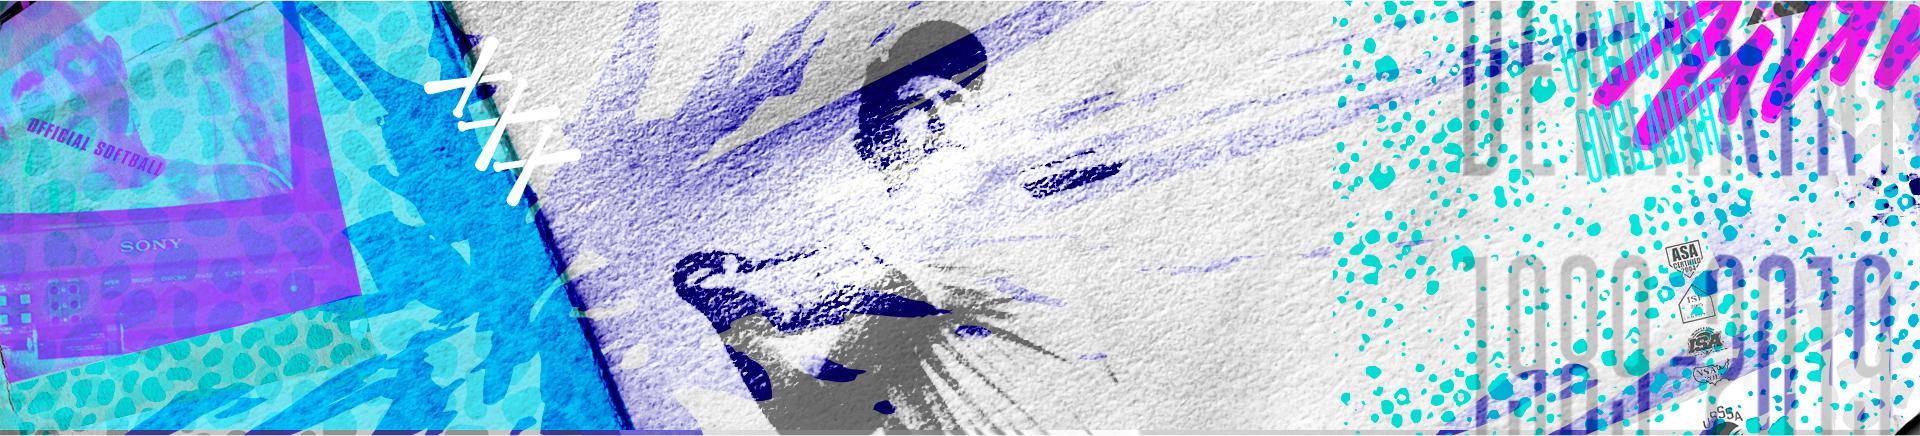 Ray DeMarini Swinging a DeMarini Bat